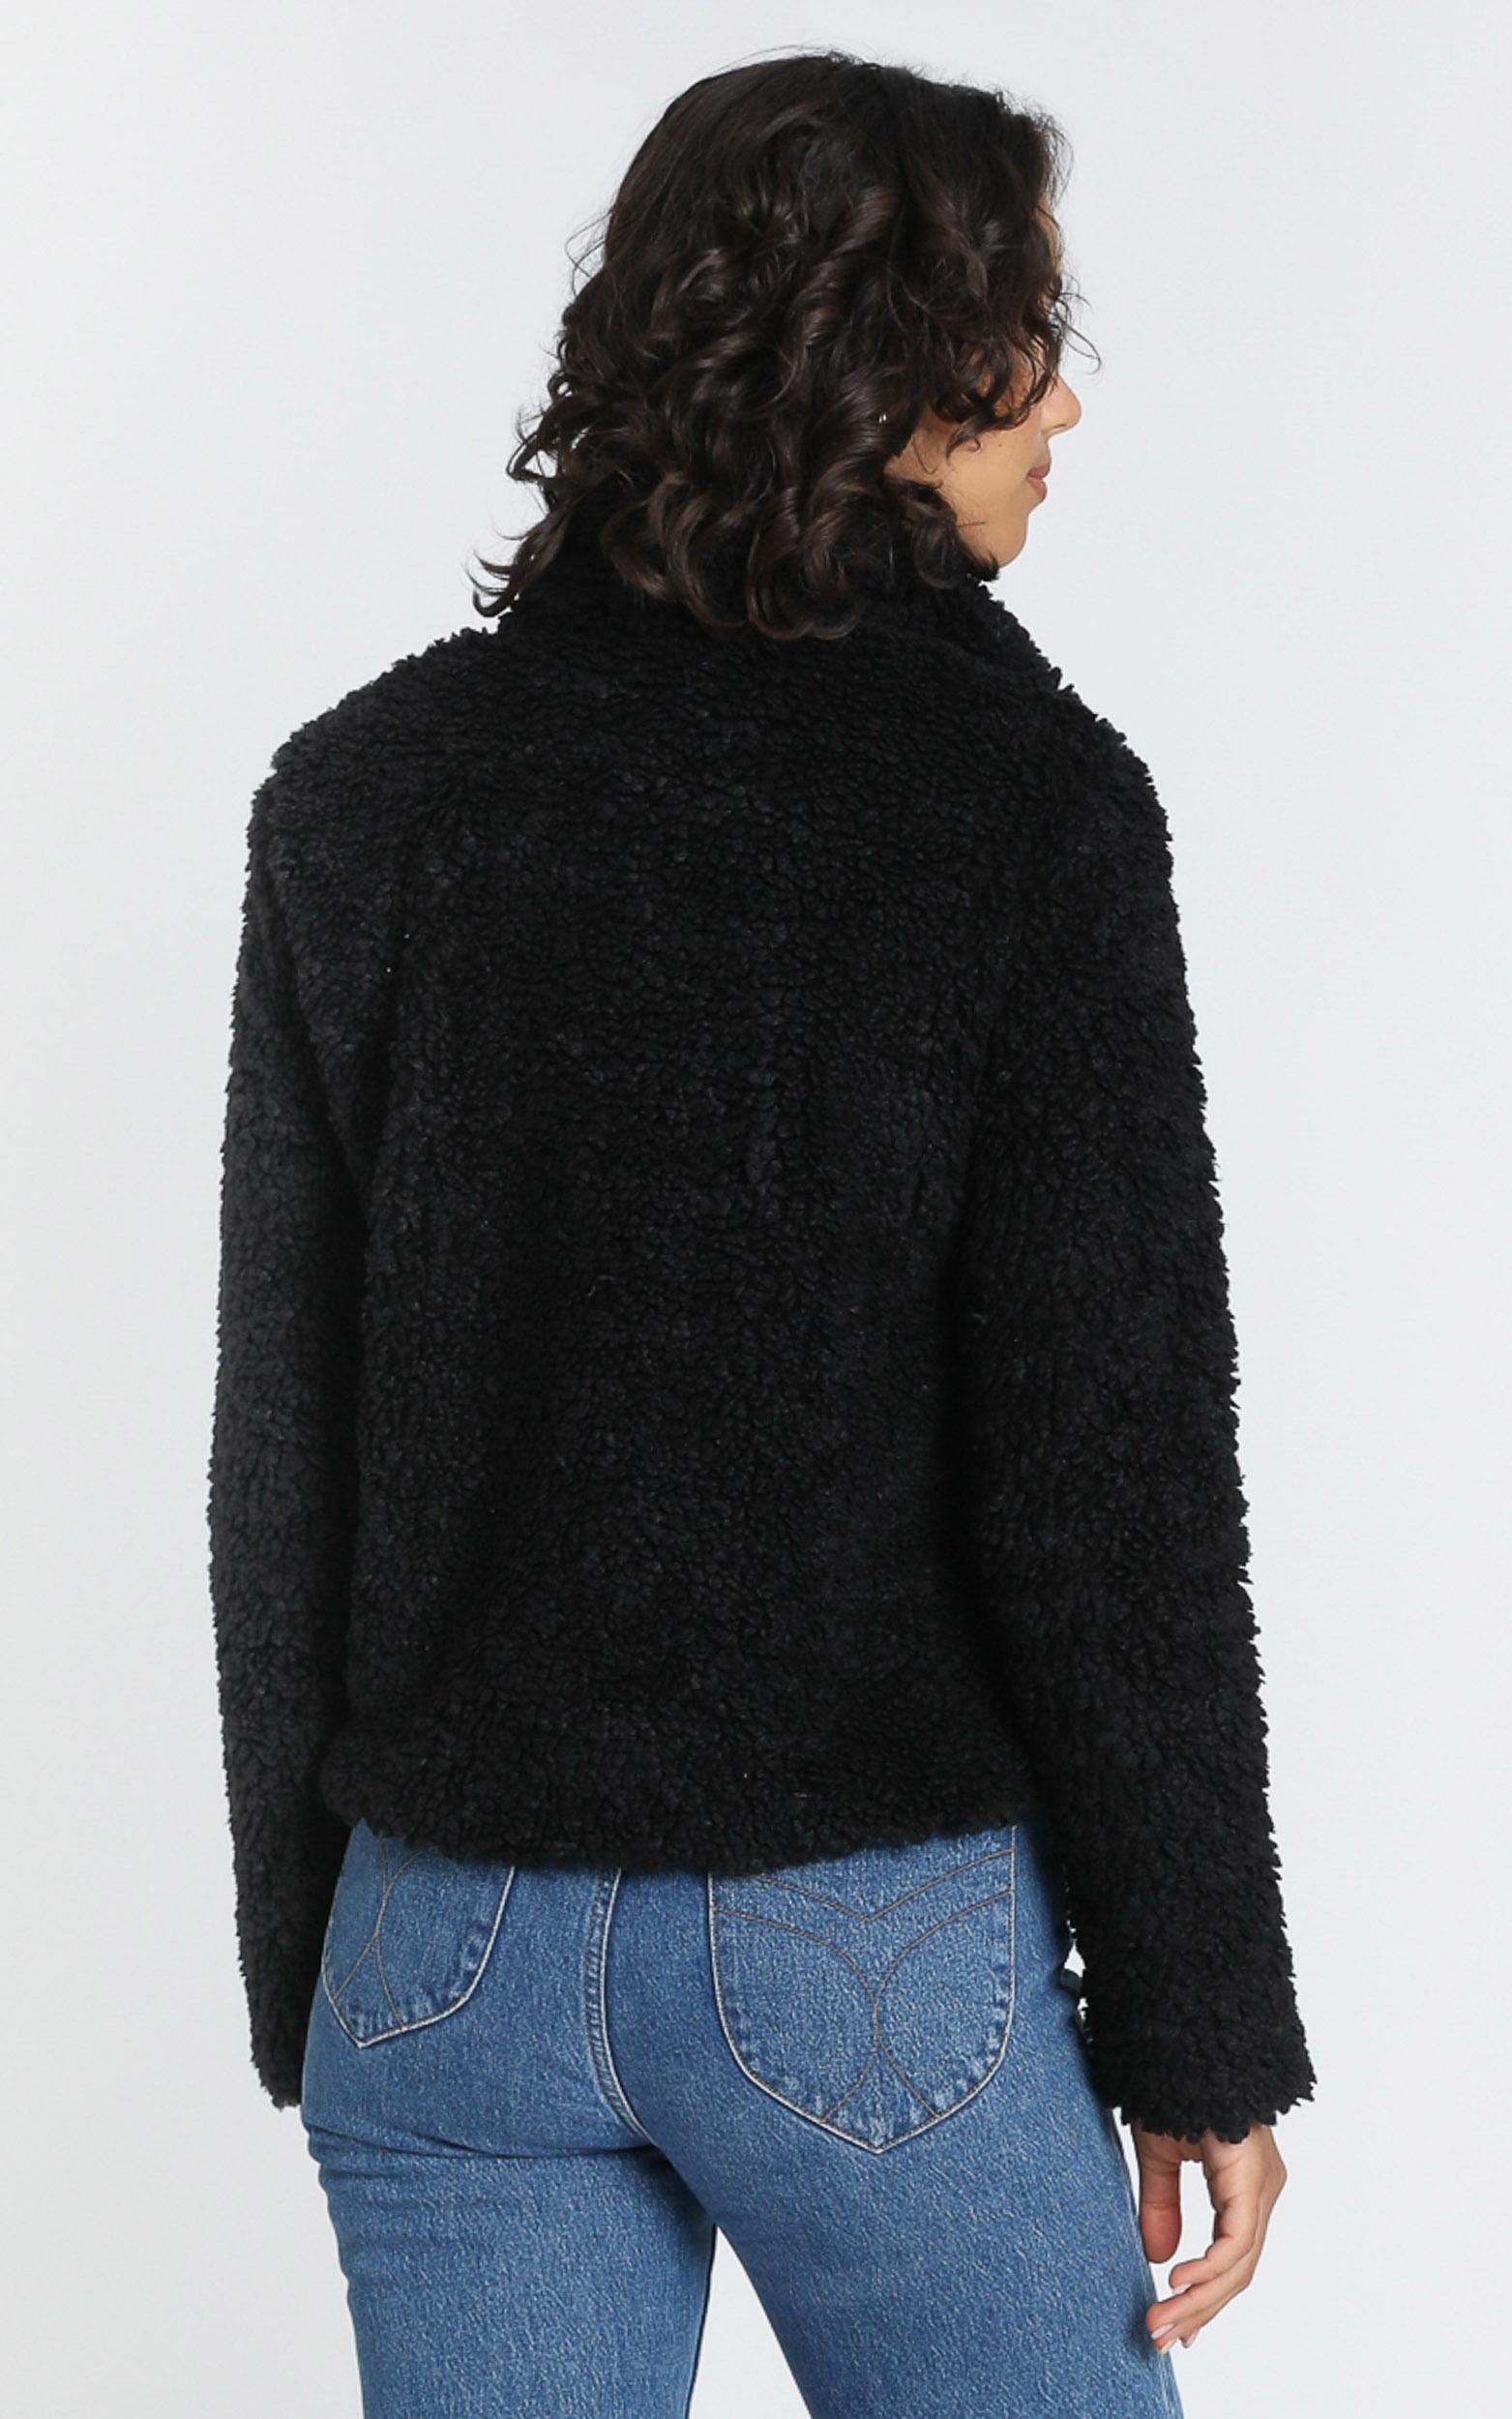 Brody Coat in Black - 8 (S), Black, hi-res image number null